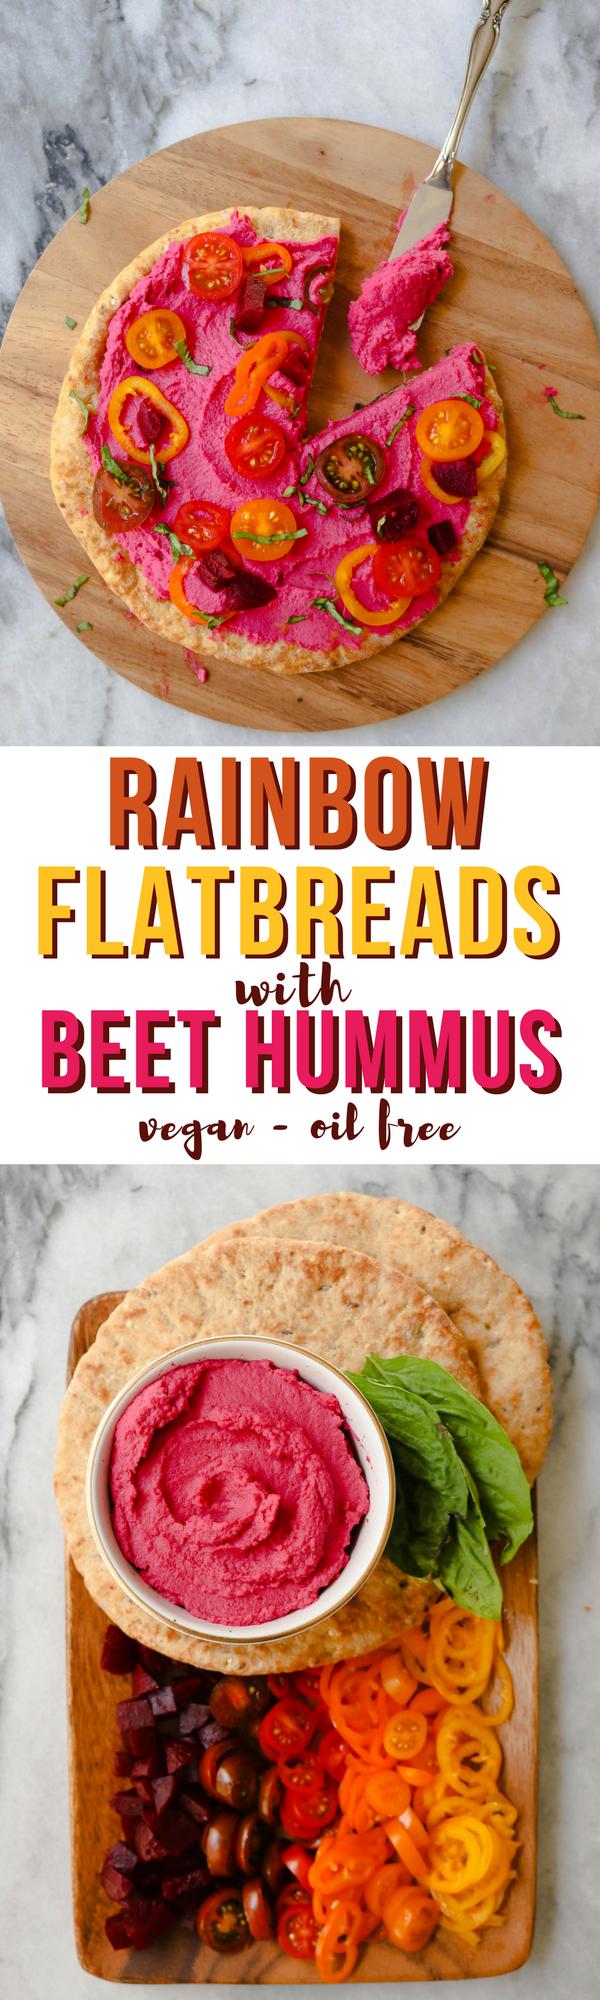 Rainbow Flatbreads with Beet Hummus - Easy & Healthy Vegan Recipe